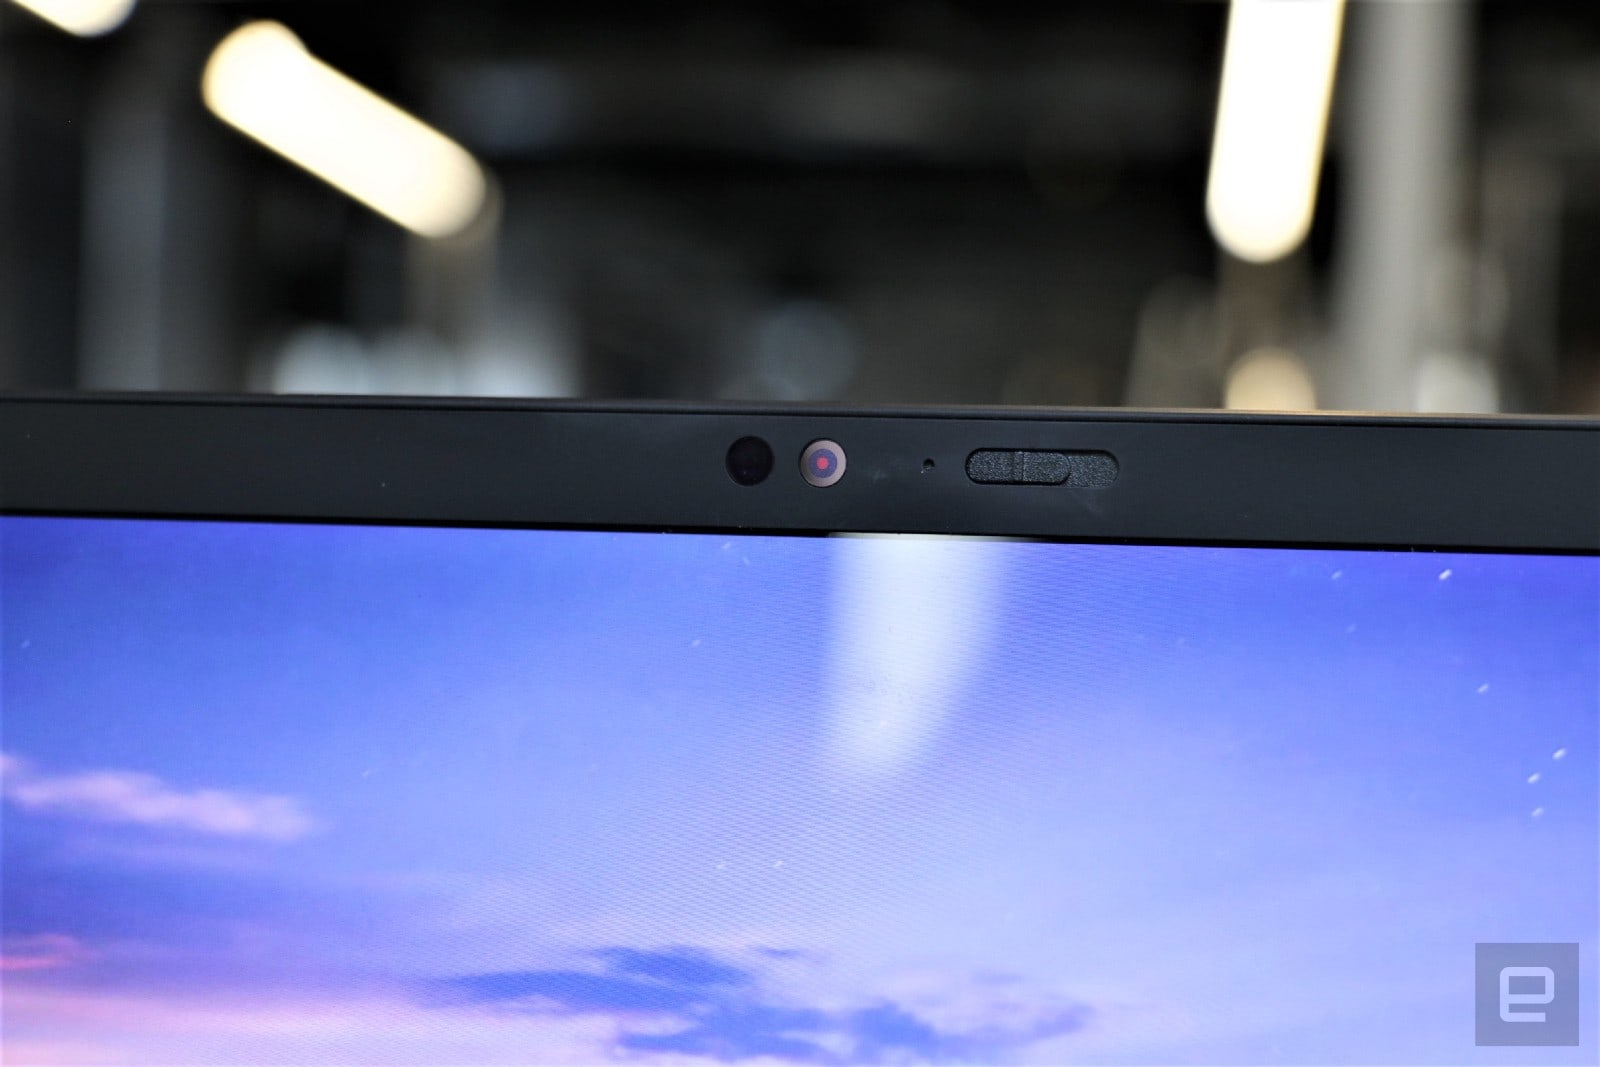 Lenovo ThinkPad X1 Carbon 2019